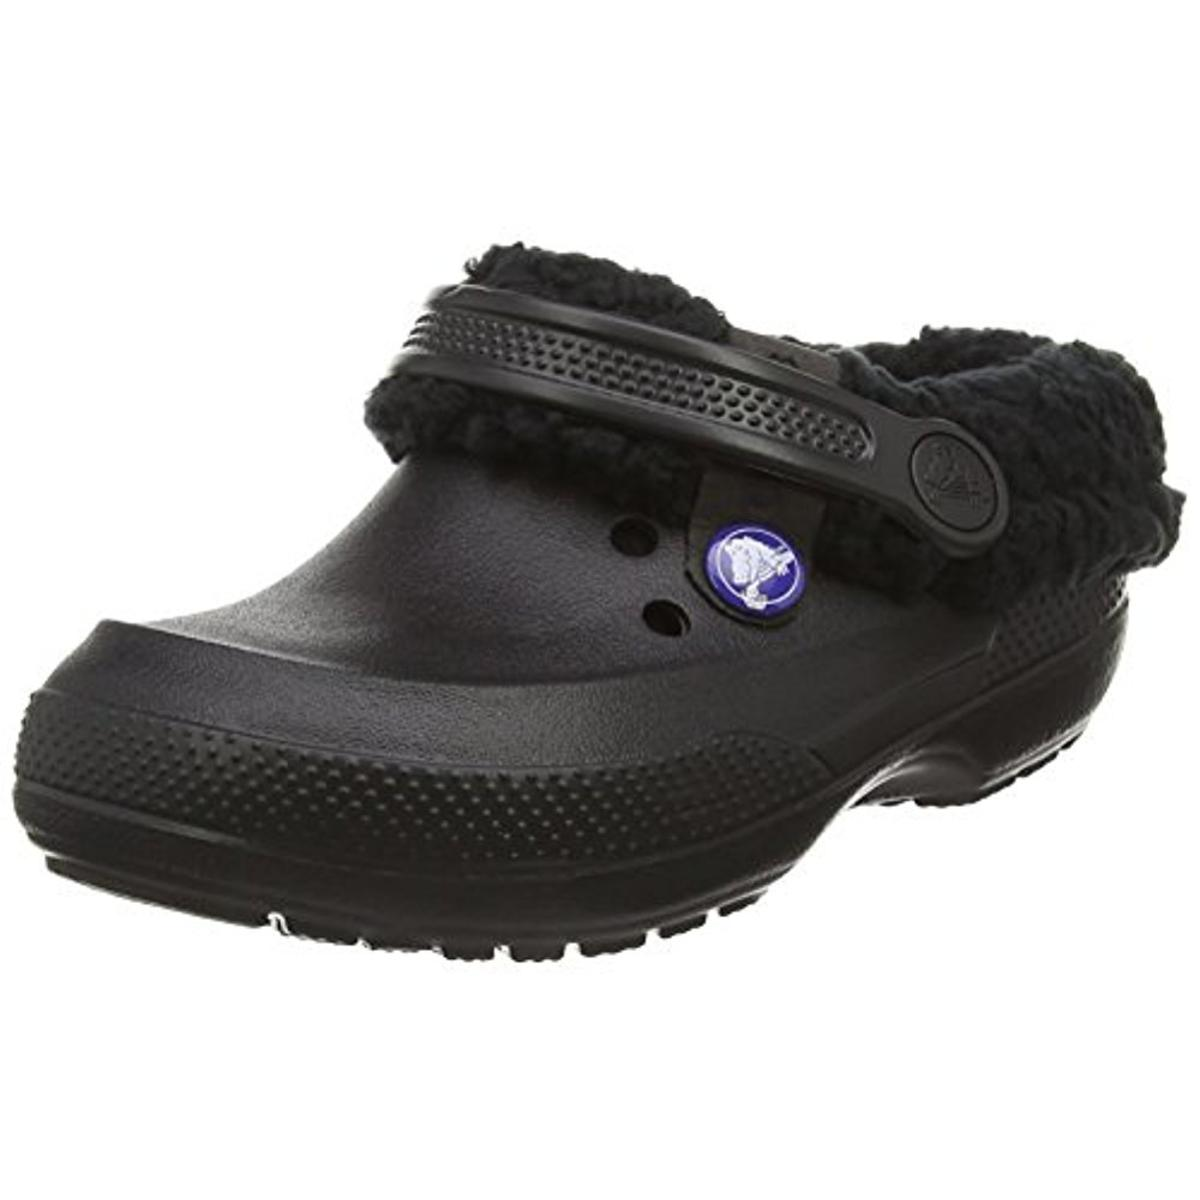 Crocs Girls Classic Blitzen II Faux Fur Casual Clogs by Crocs